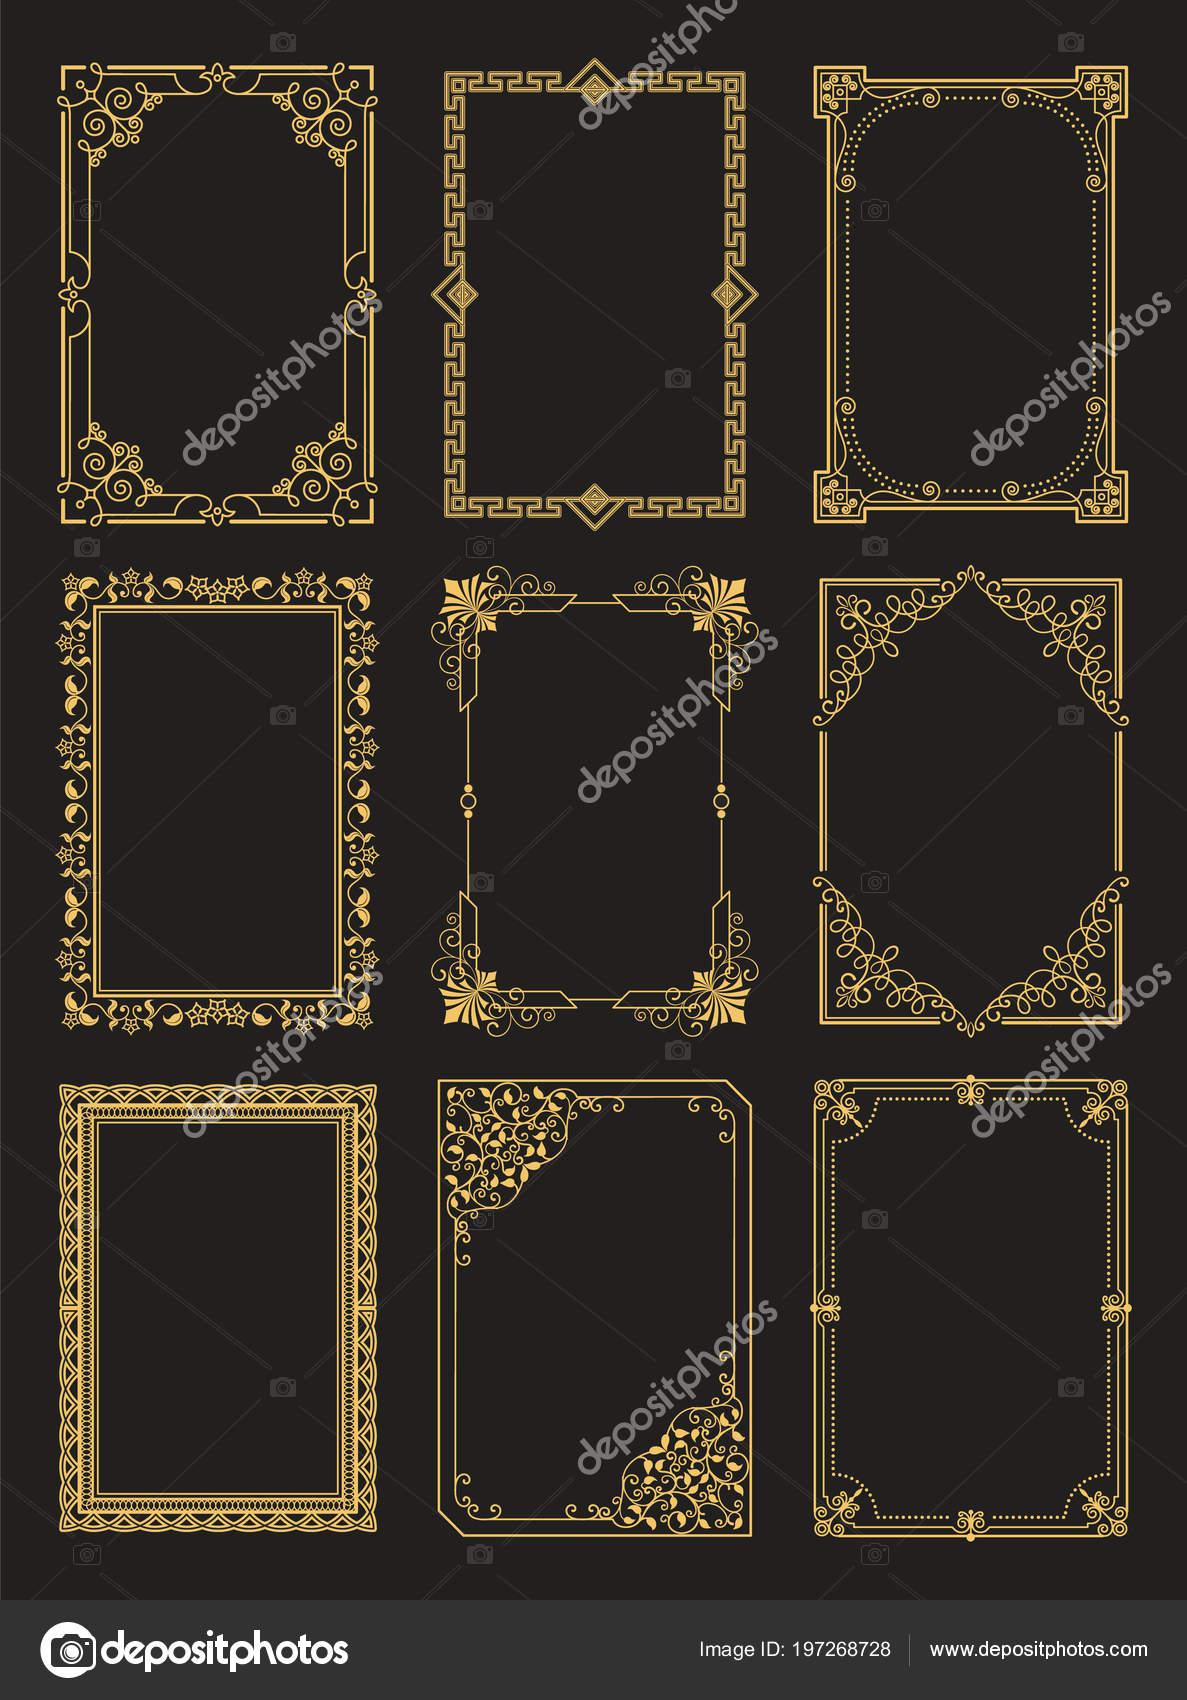 6dd29d6f870 Vintage frames collection golden borders isolated on black background.  Decorative gold frames set ornamental elements in corners vector  illustrations ...